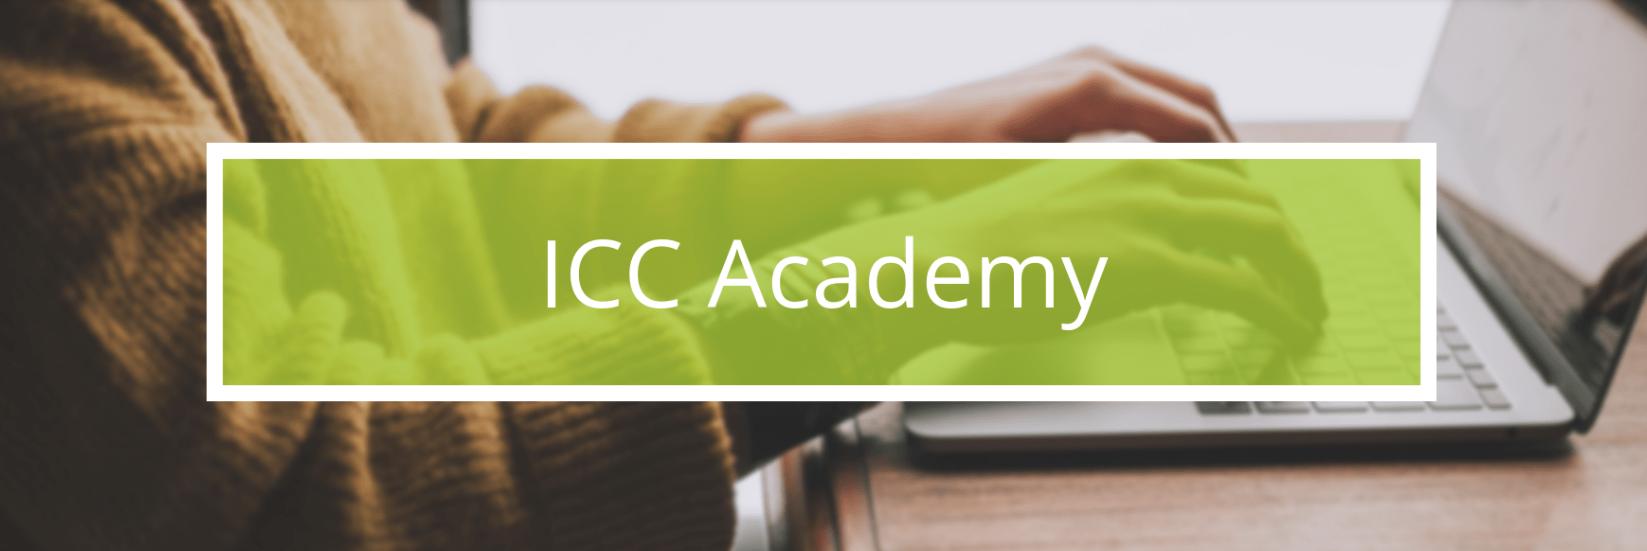 ICC Academy